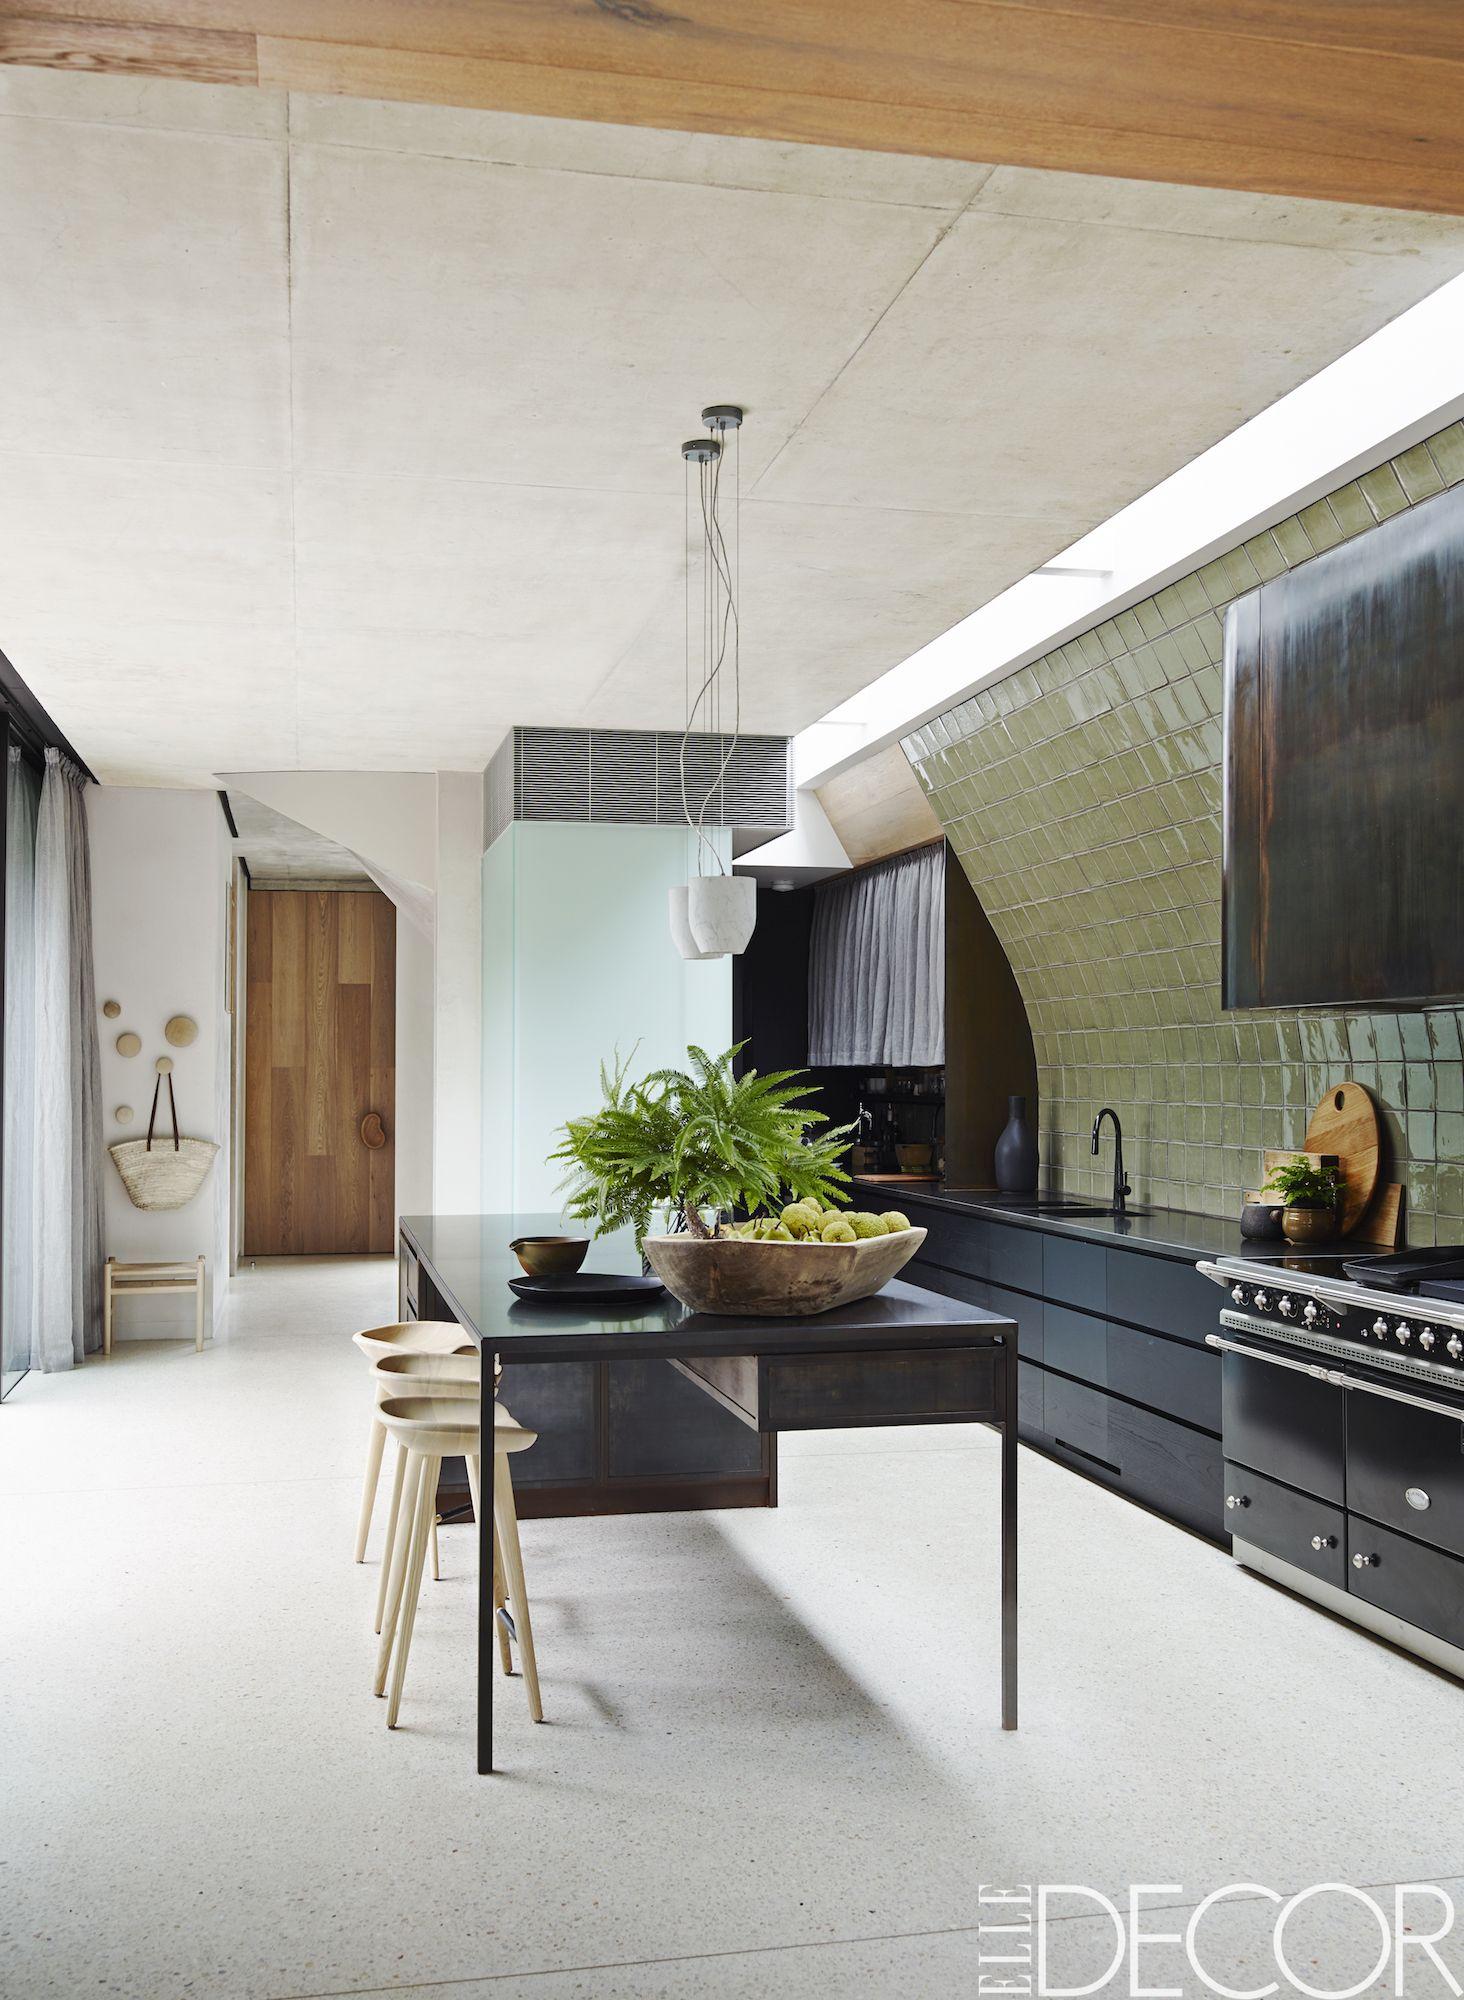 20 Gorgeous Kitchen Tile Backsplashes - Best Kitchen Tile Ideas on 10x14 kitchen design, 11x14 kitchen design, 10x12 kitchen design, 10x20 kitchen design, 9x12 kitchen design, 8x8 kitchen design, 10x15 kitchen design, 8x14 kitchen design, 12x12 kitchen design, 8x10 kitchen design, 6x6 kitchen design, 12x18 kitchen design,